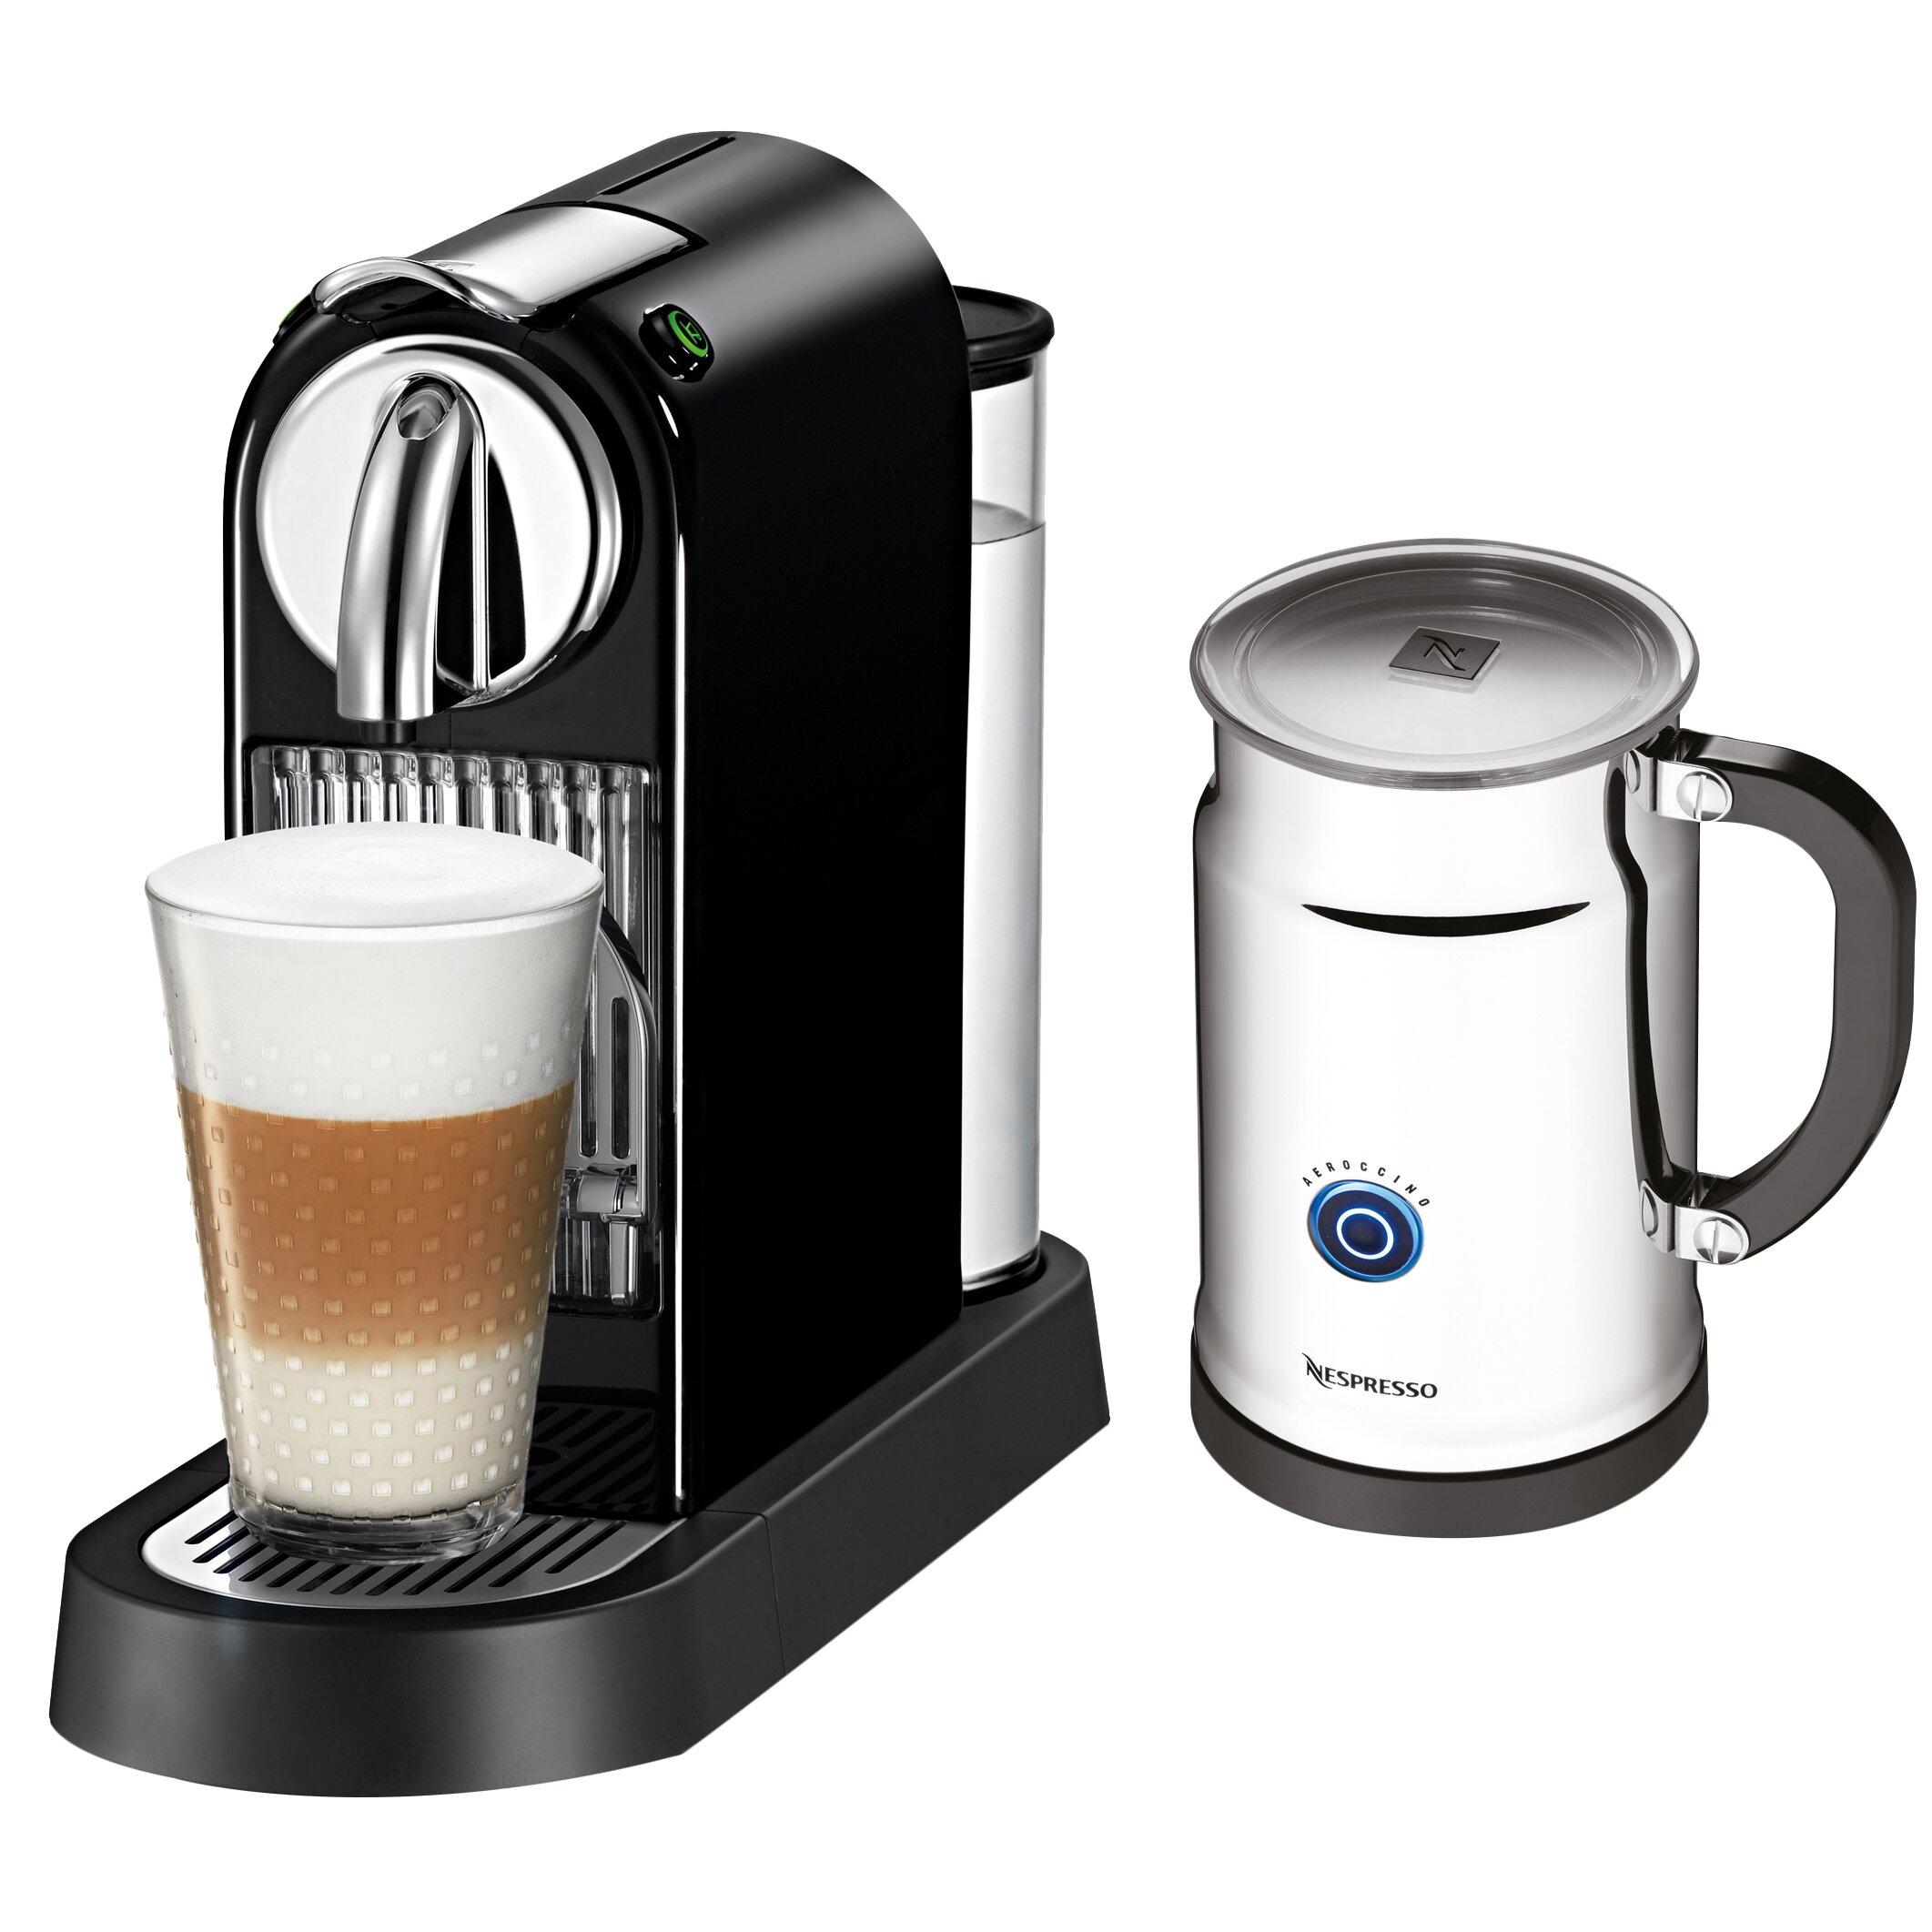 Nespresso Coffee Maker ~ Nespresso citiz espresso maker with aeroccino milk